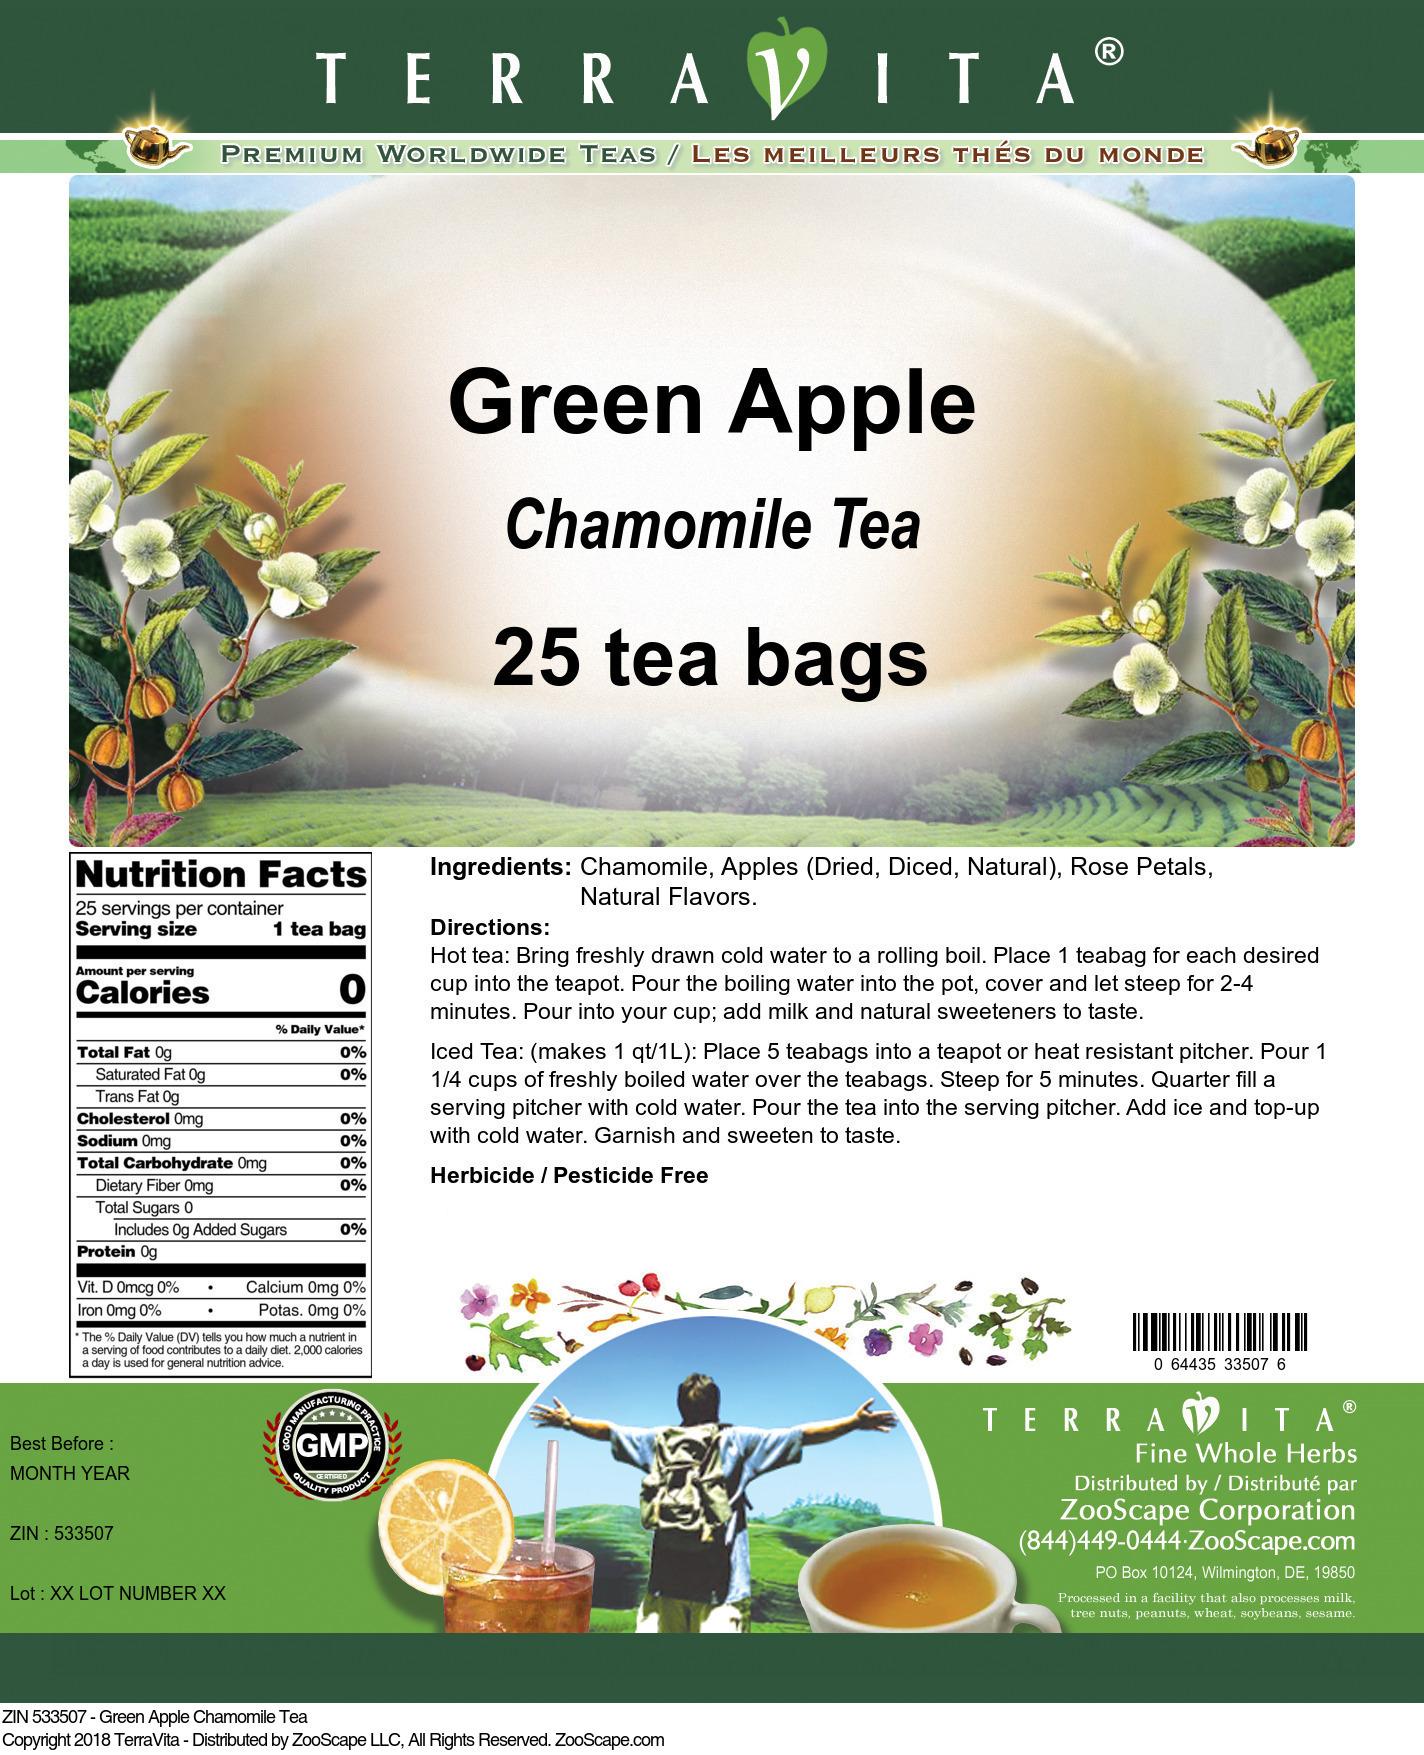 Green Apple Chamomile Tea